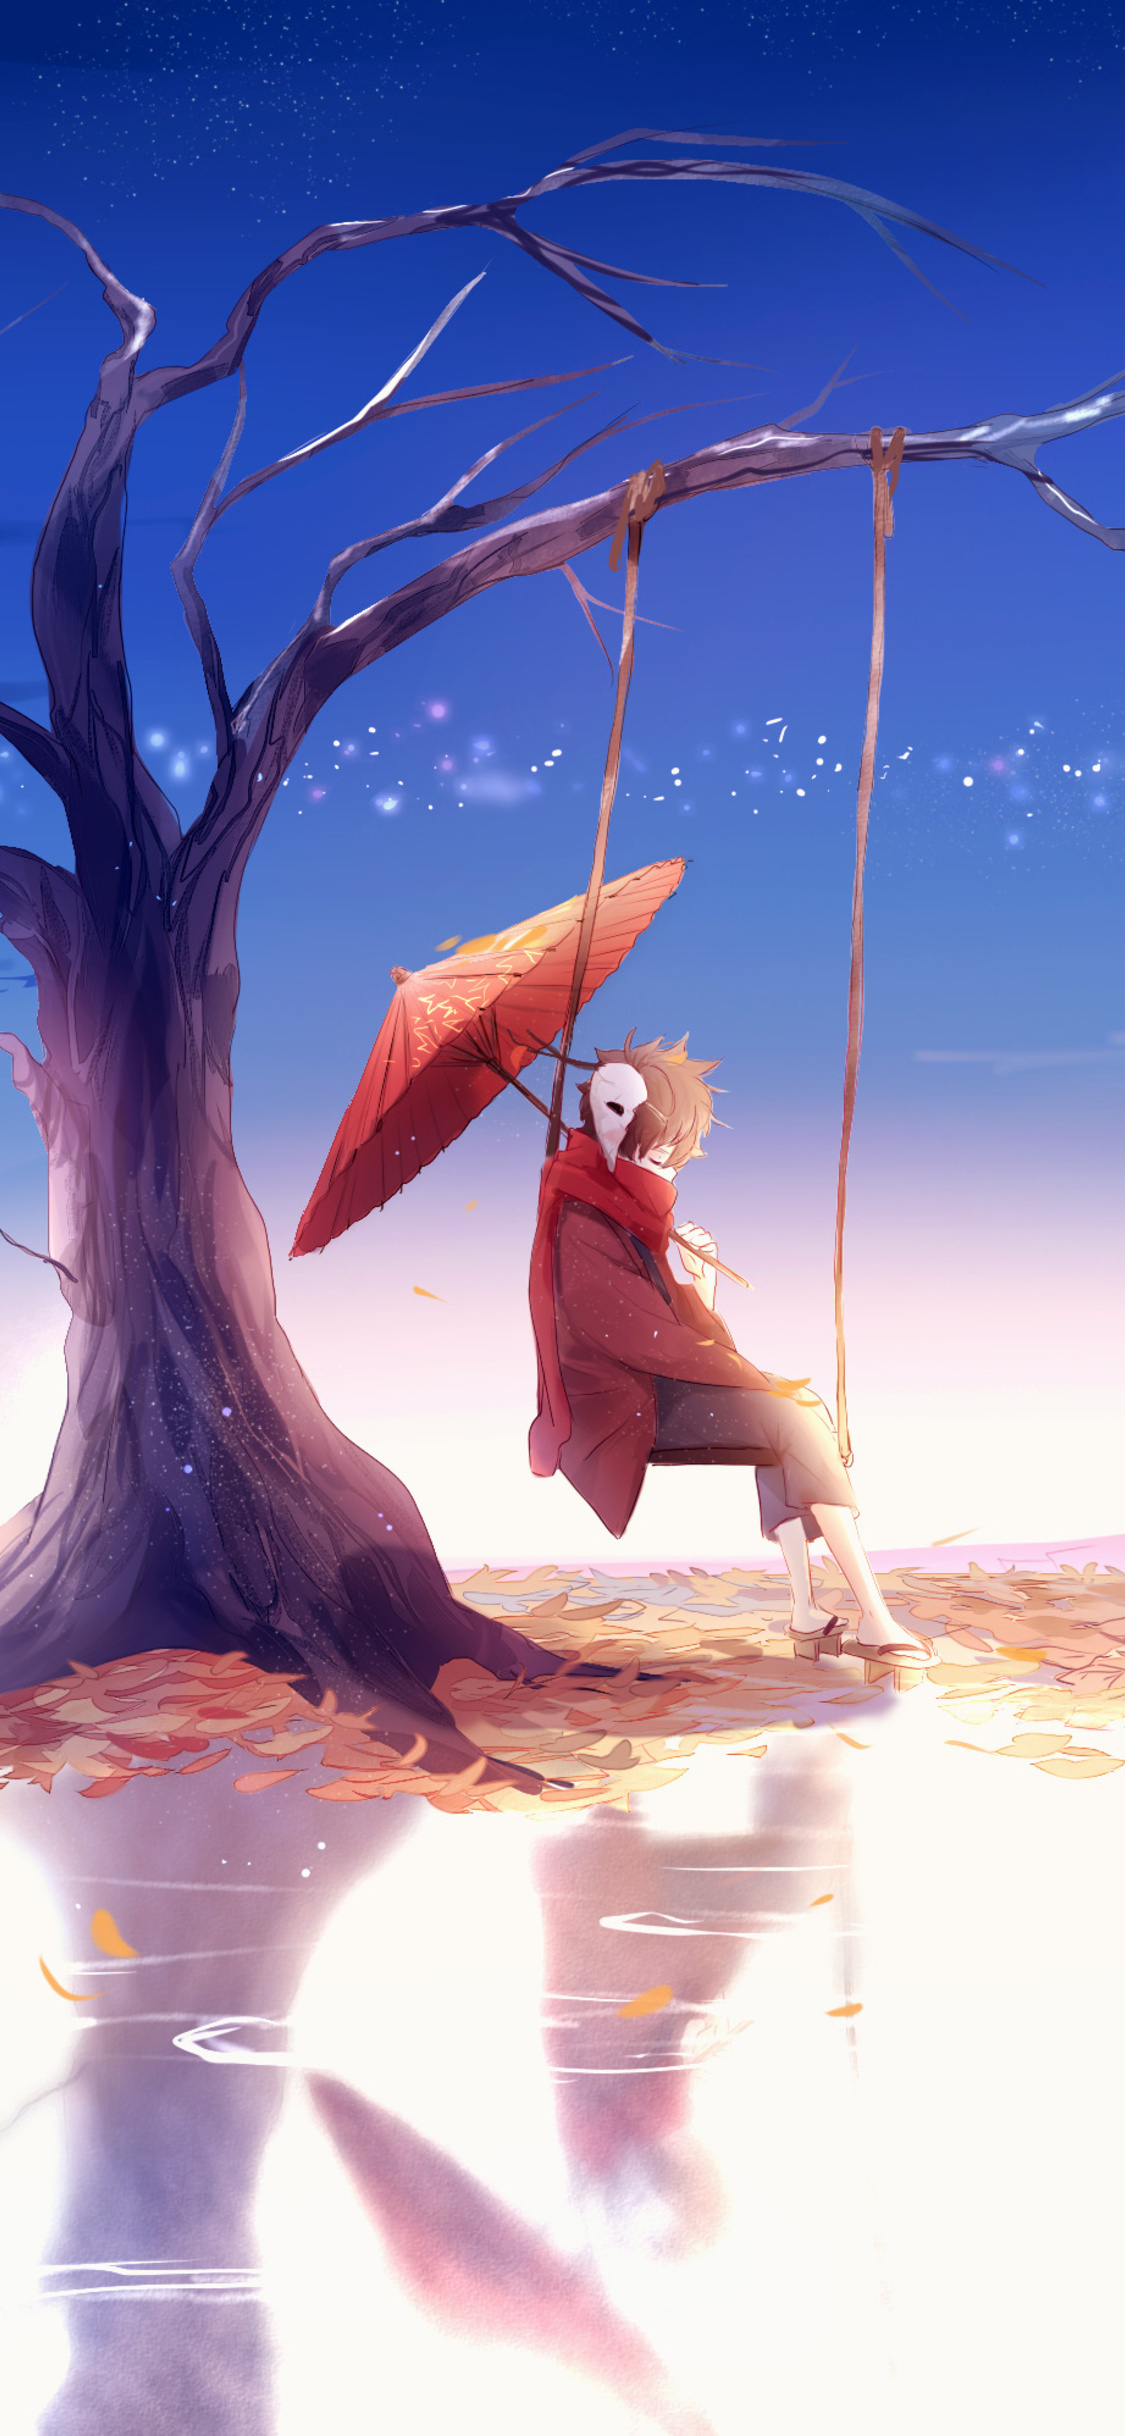 1125x2436 Anime Boy Swing Umbrella 4k Iphone Xs Iphone 10 Iphone X